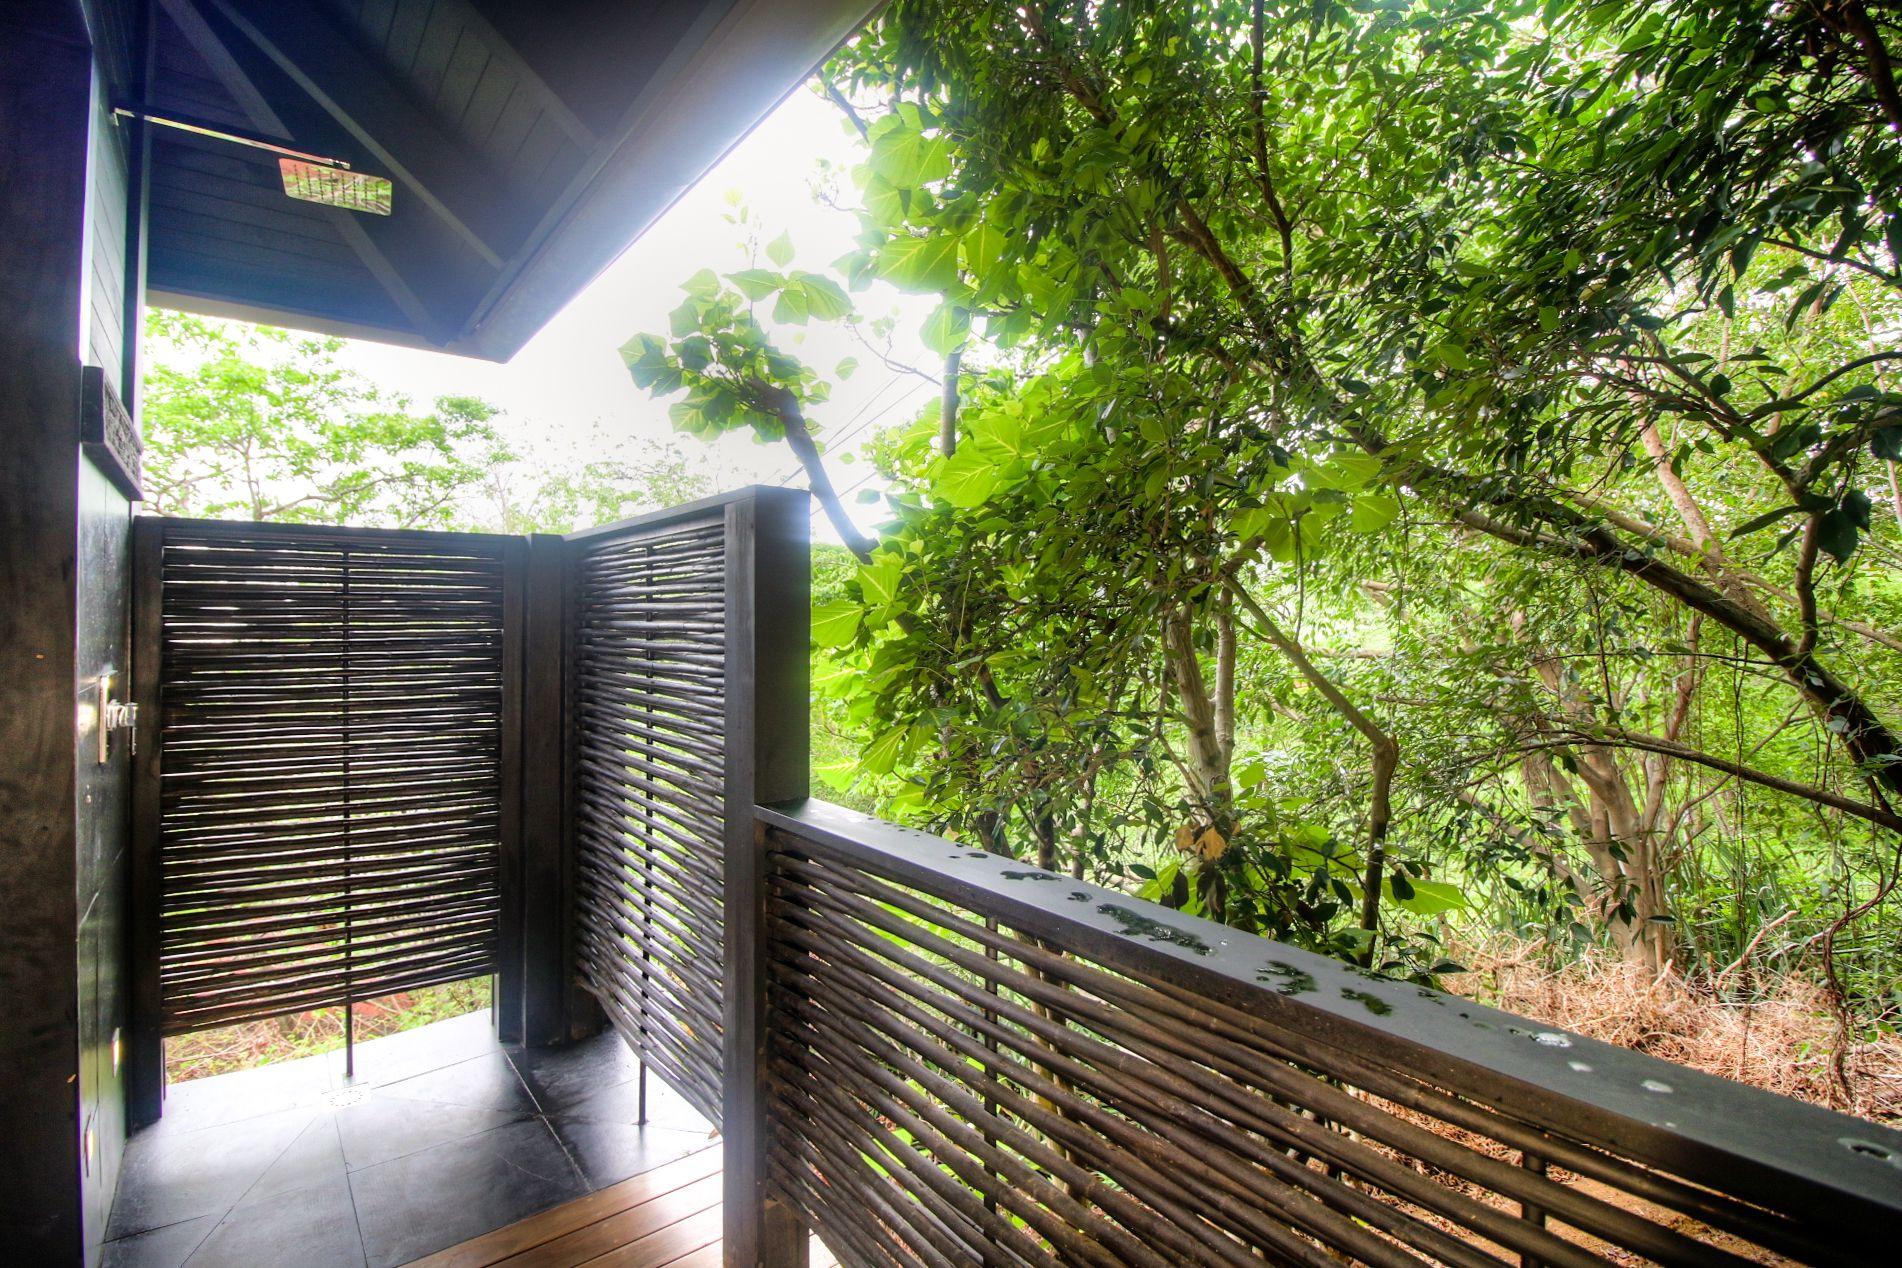 Elegant outdoor shower feels like tropical rain